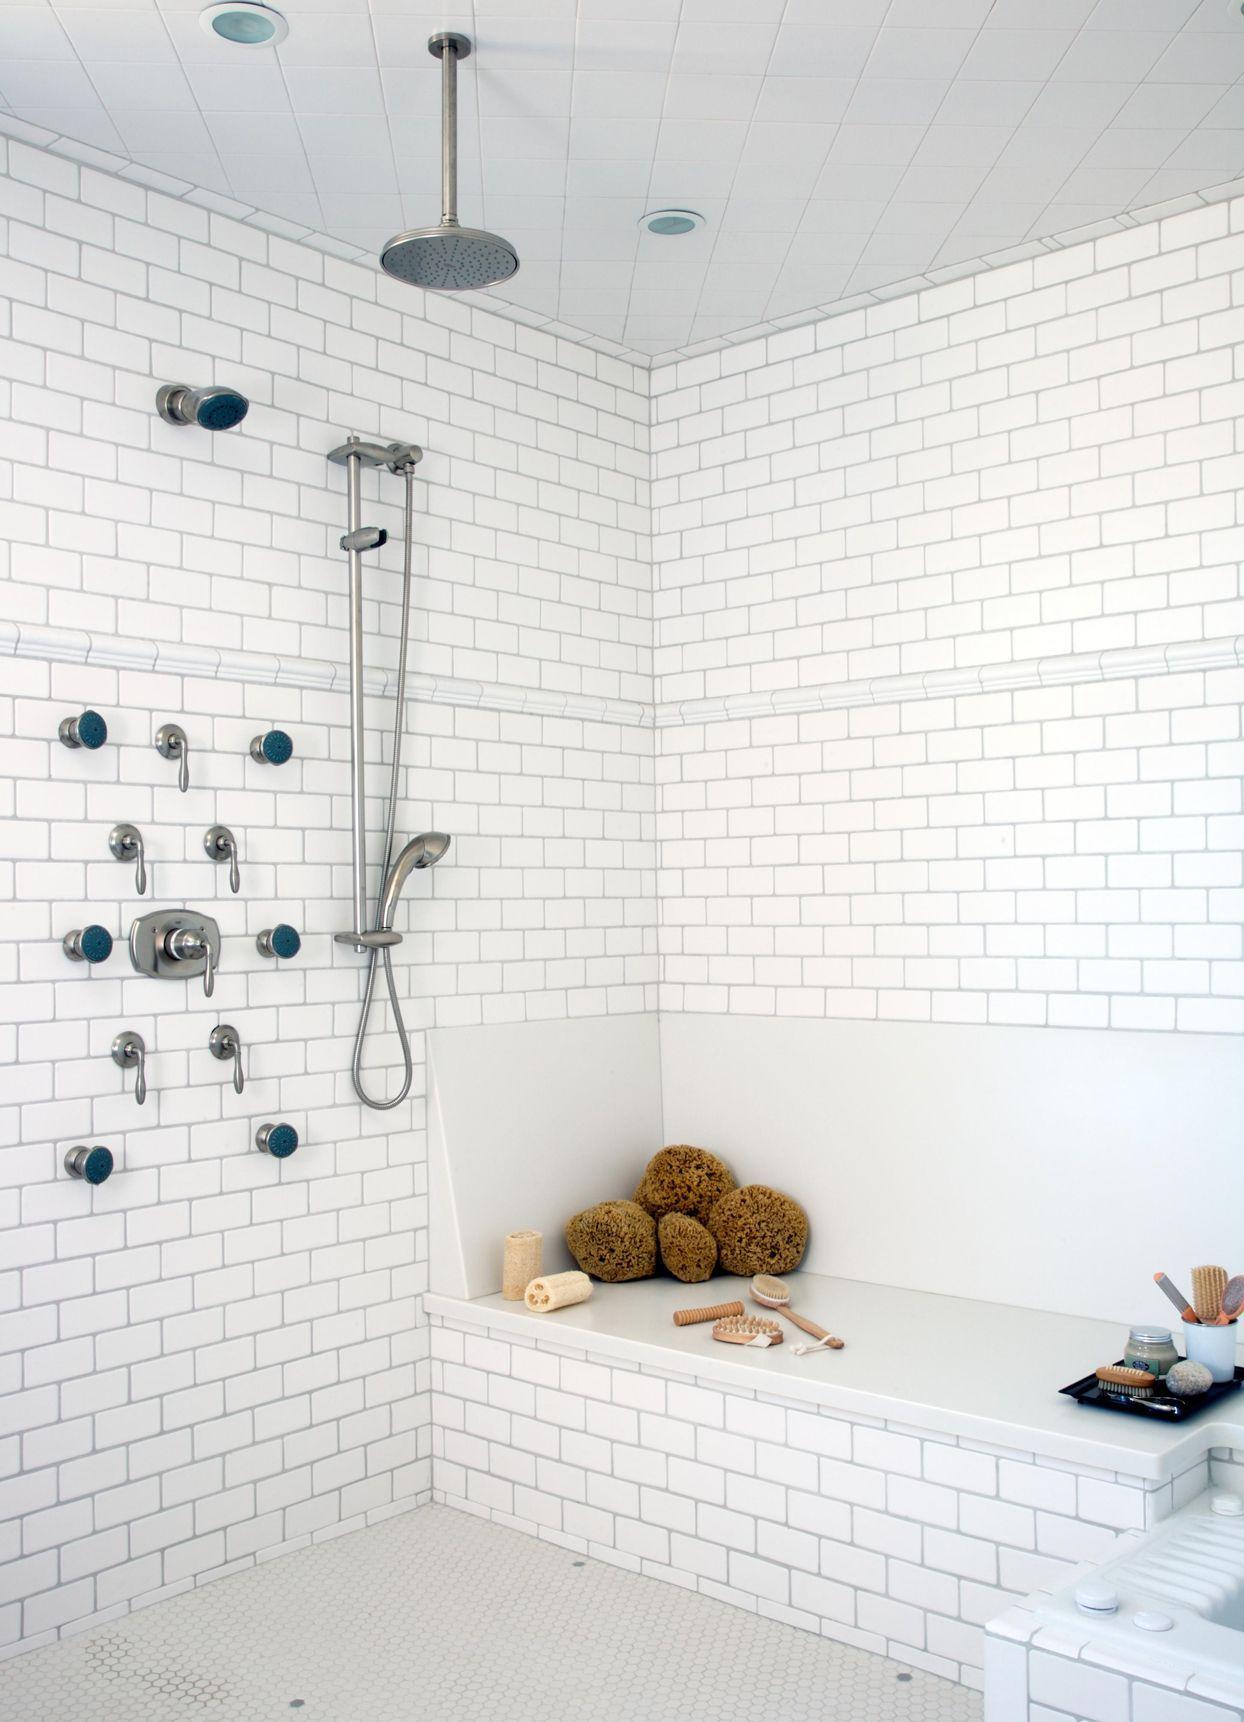 33 Breathtaking Walk In Shower Ideas Built In Shower Seat Shower Tile Bathroom Remodel Shower